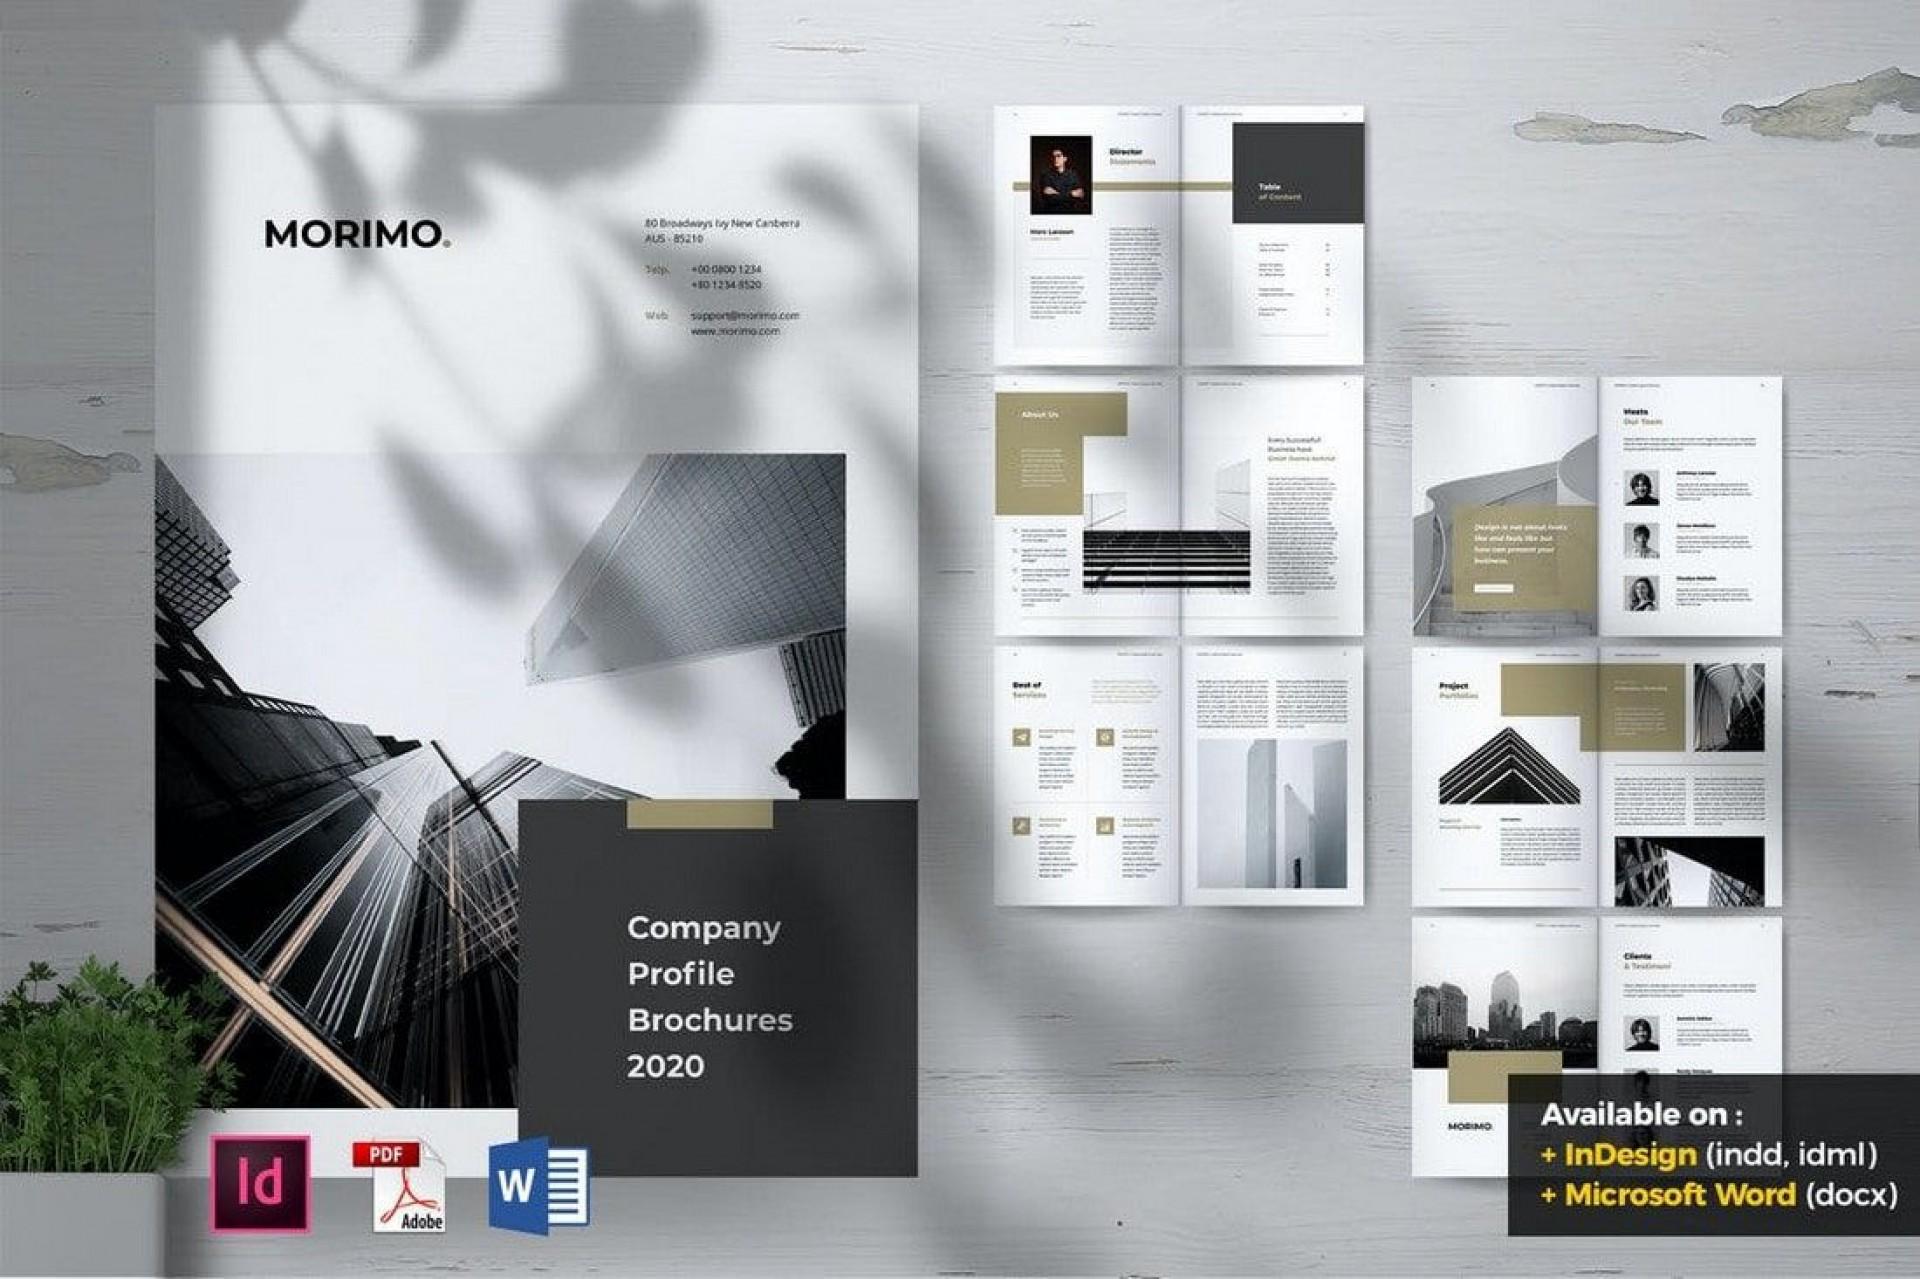 008 Stunning M Word Travel Brochure Template Sample  Microsoft Free1920